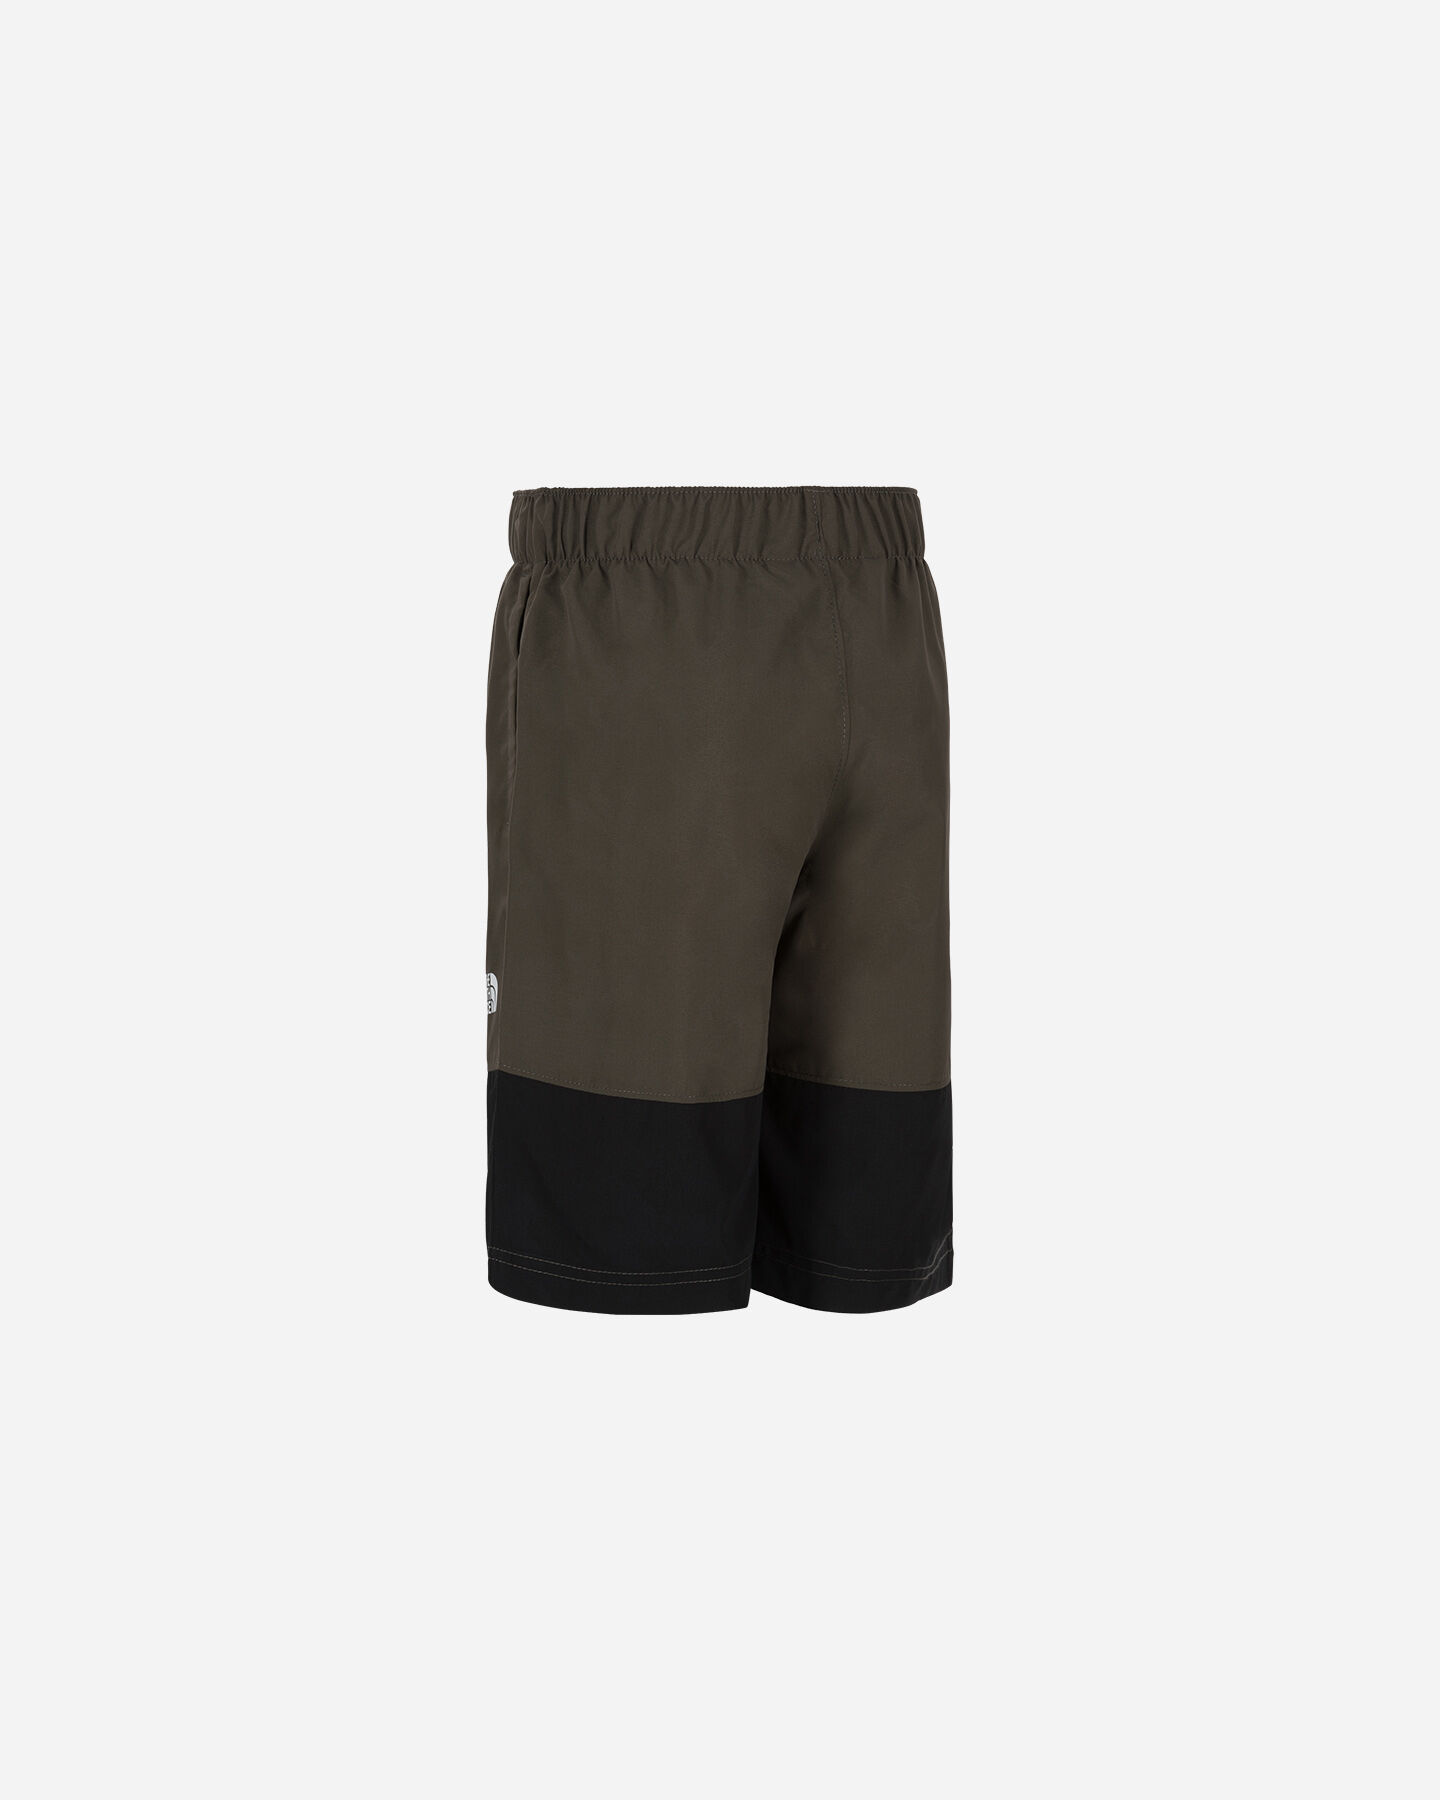 Pantaloncini THE NORTH FACE CLASS V JR S5018252 scatto 1